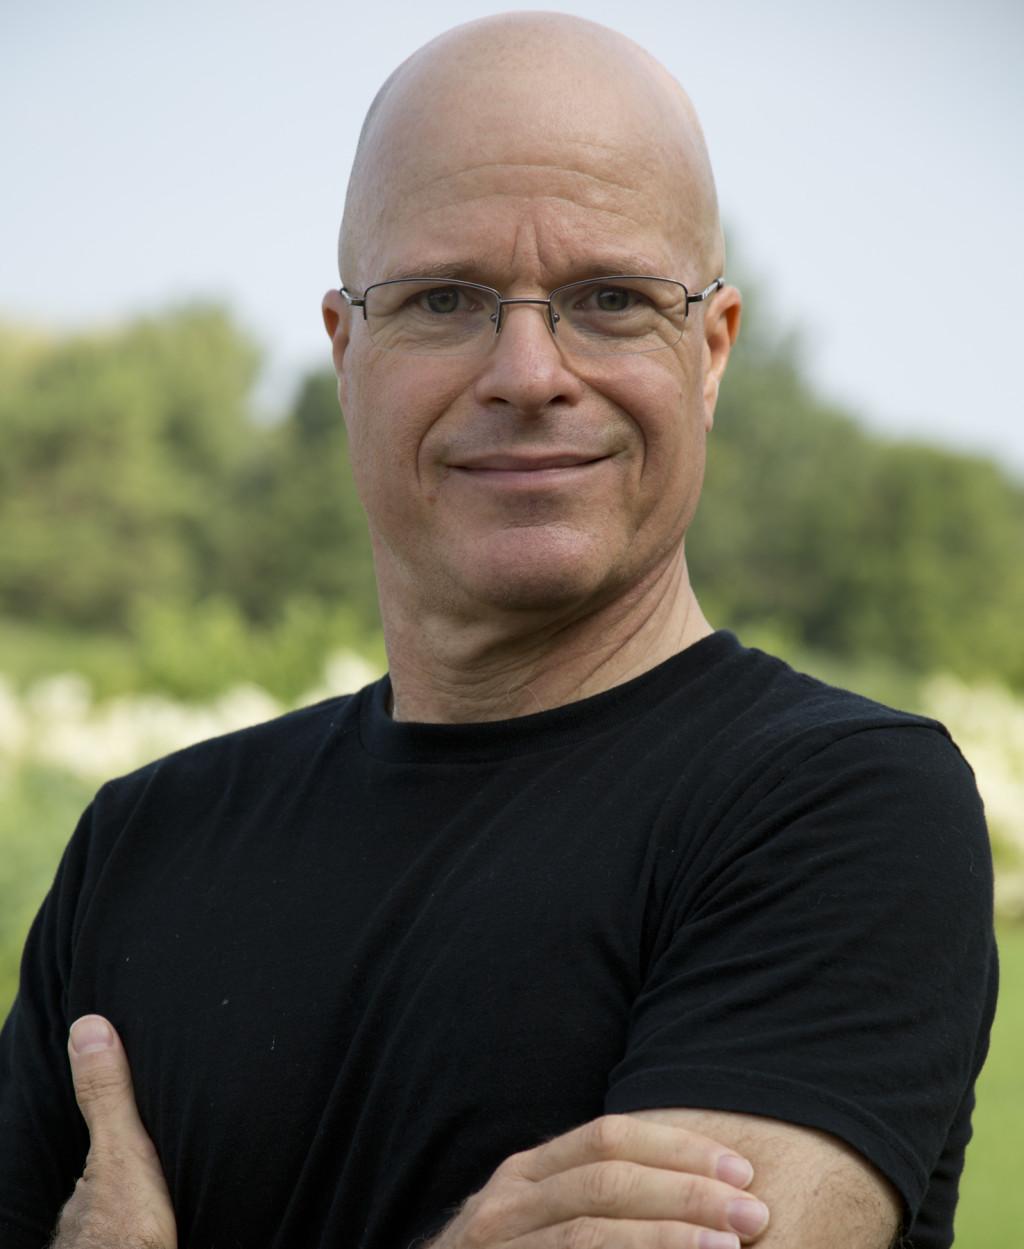 Personal Trainer Evanston, Illinois - Greg S